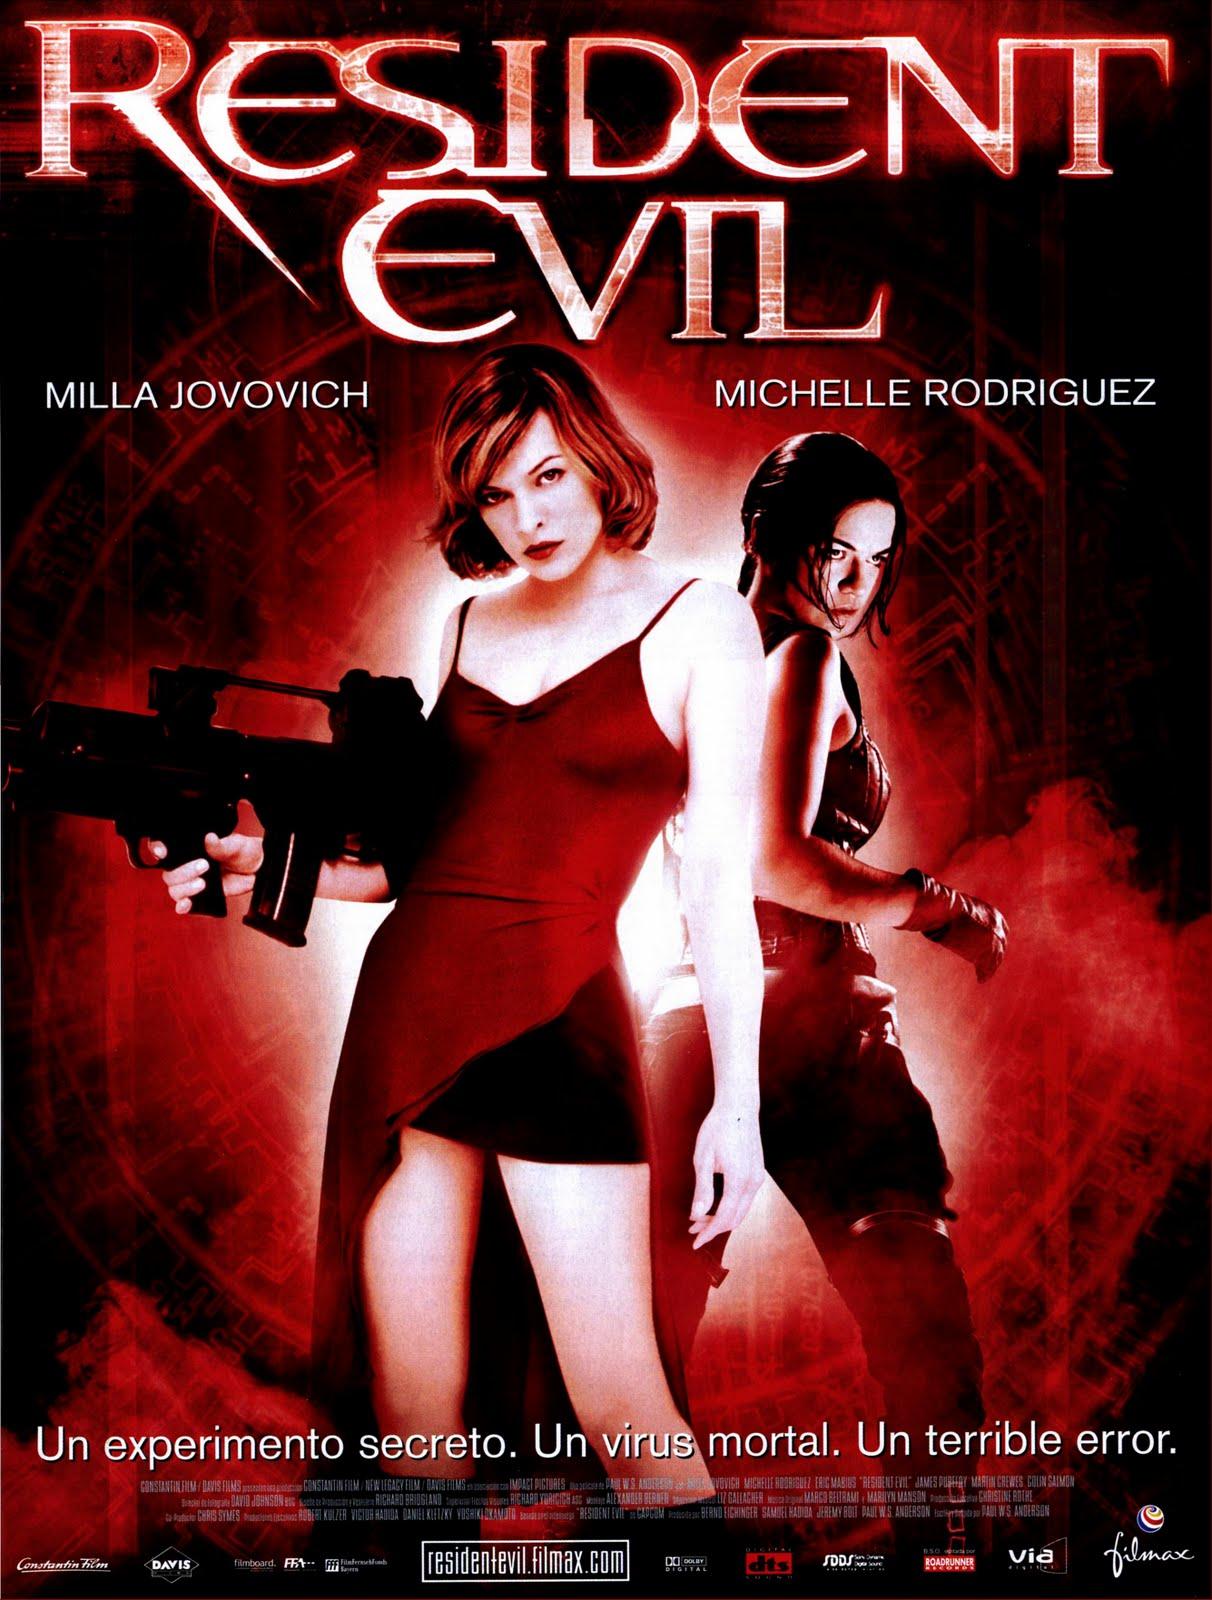 http://2.bp.blogspot.com/_gyK1dc6Twcs/TI3jw_arruI/AAAAAAAABAo/QHxRswS8itc/s1600/Resident+Evil.jpg